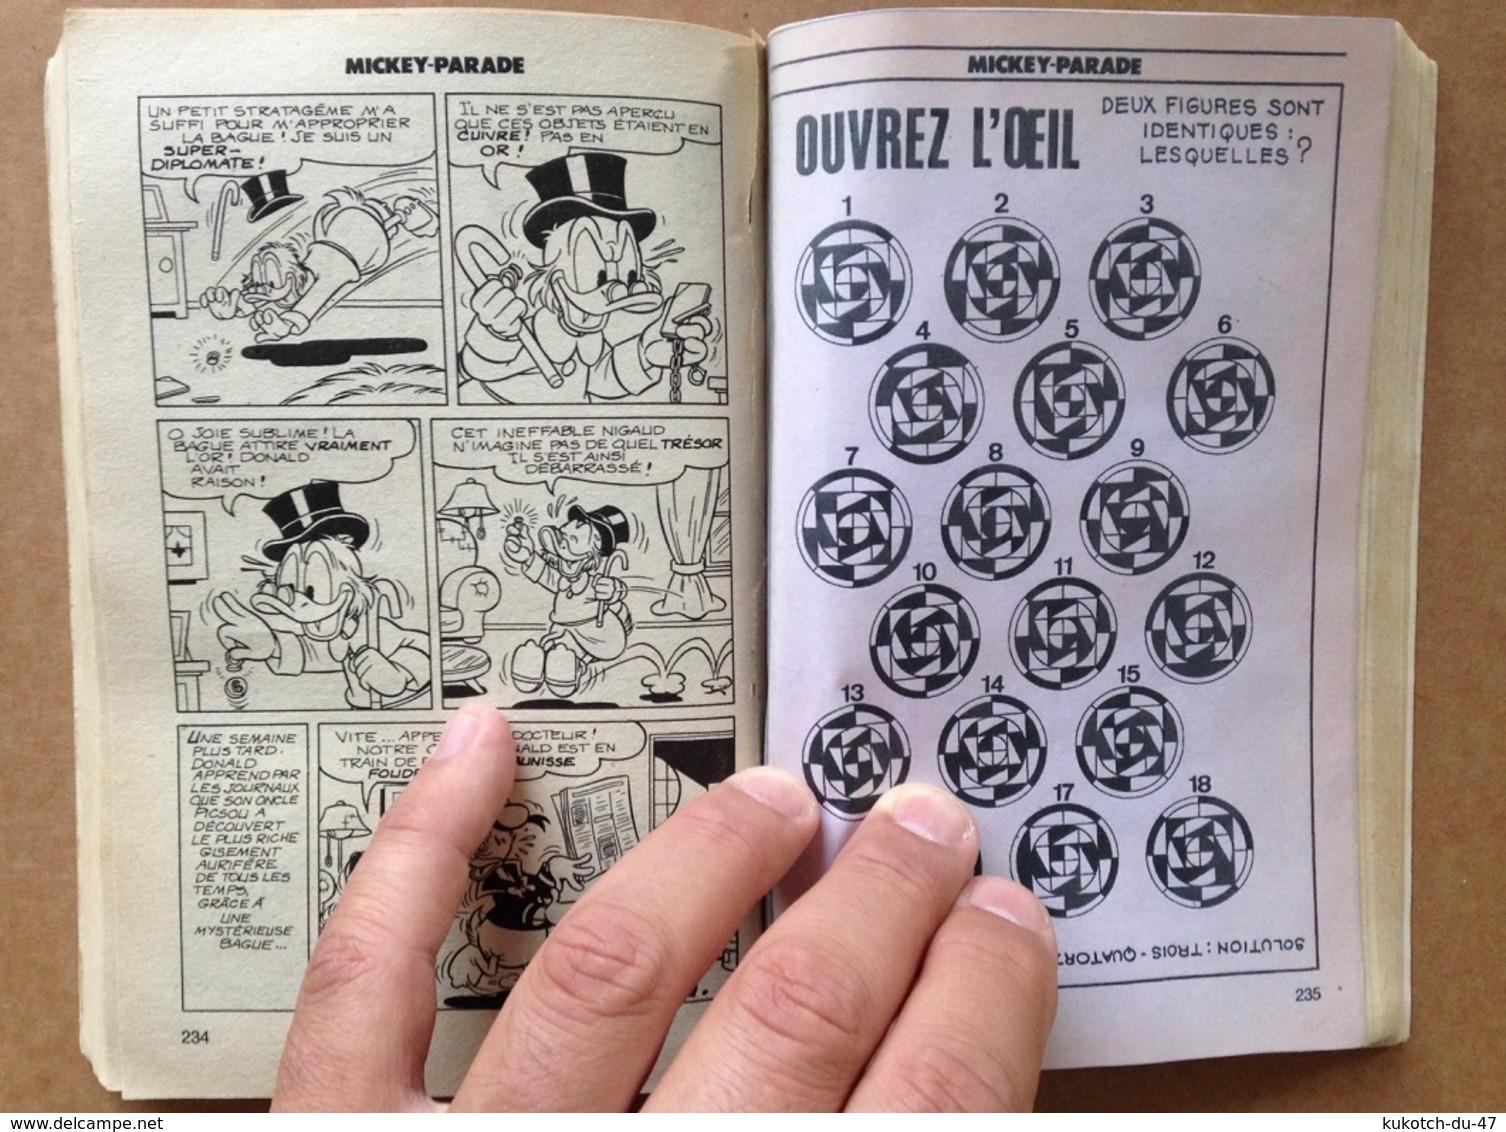 Disney - Mickey Parade - Année 1981 - N°24 (avec Grand Défaut D'usure) - Mickey Parade